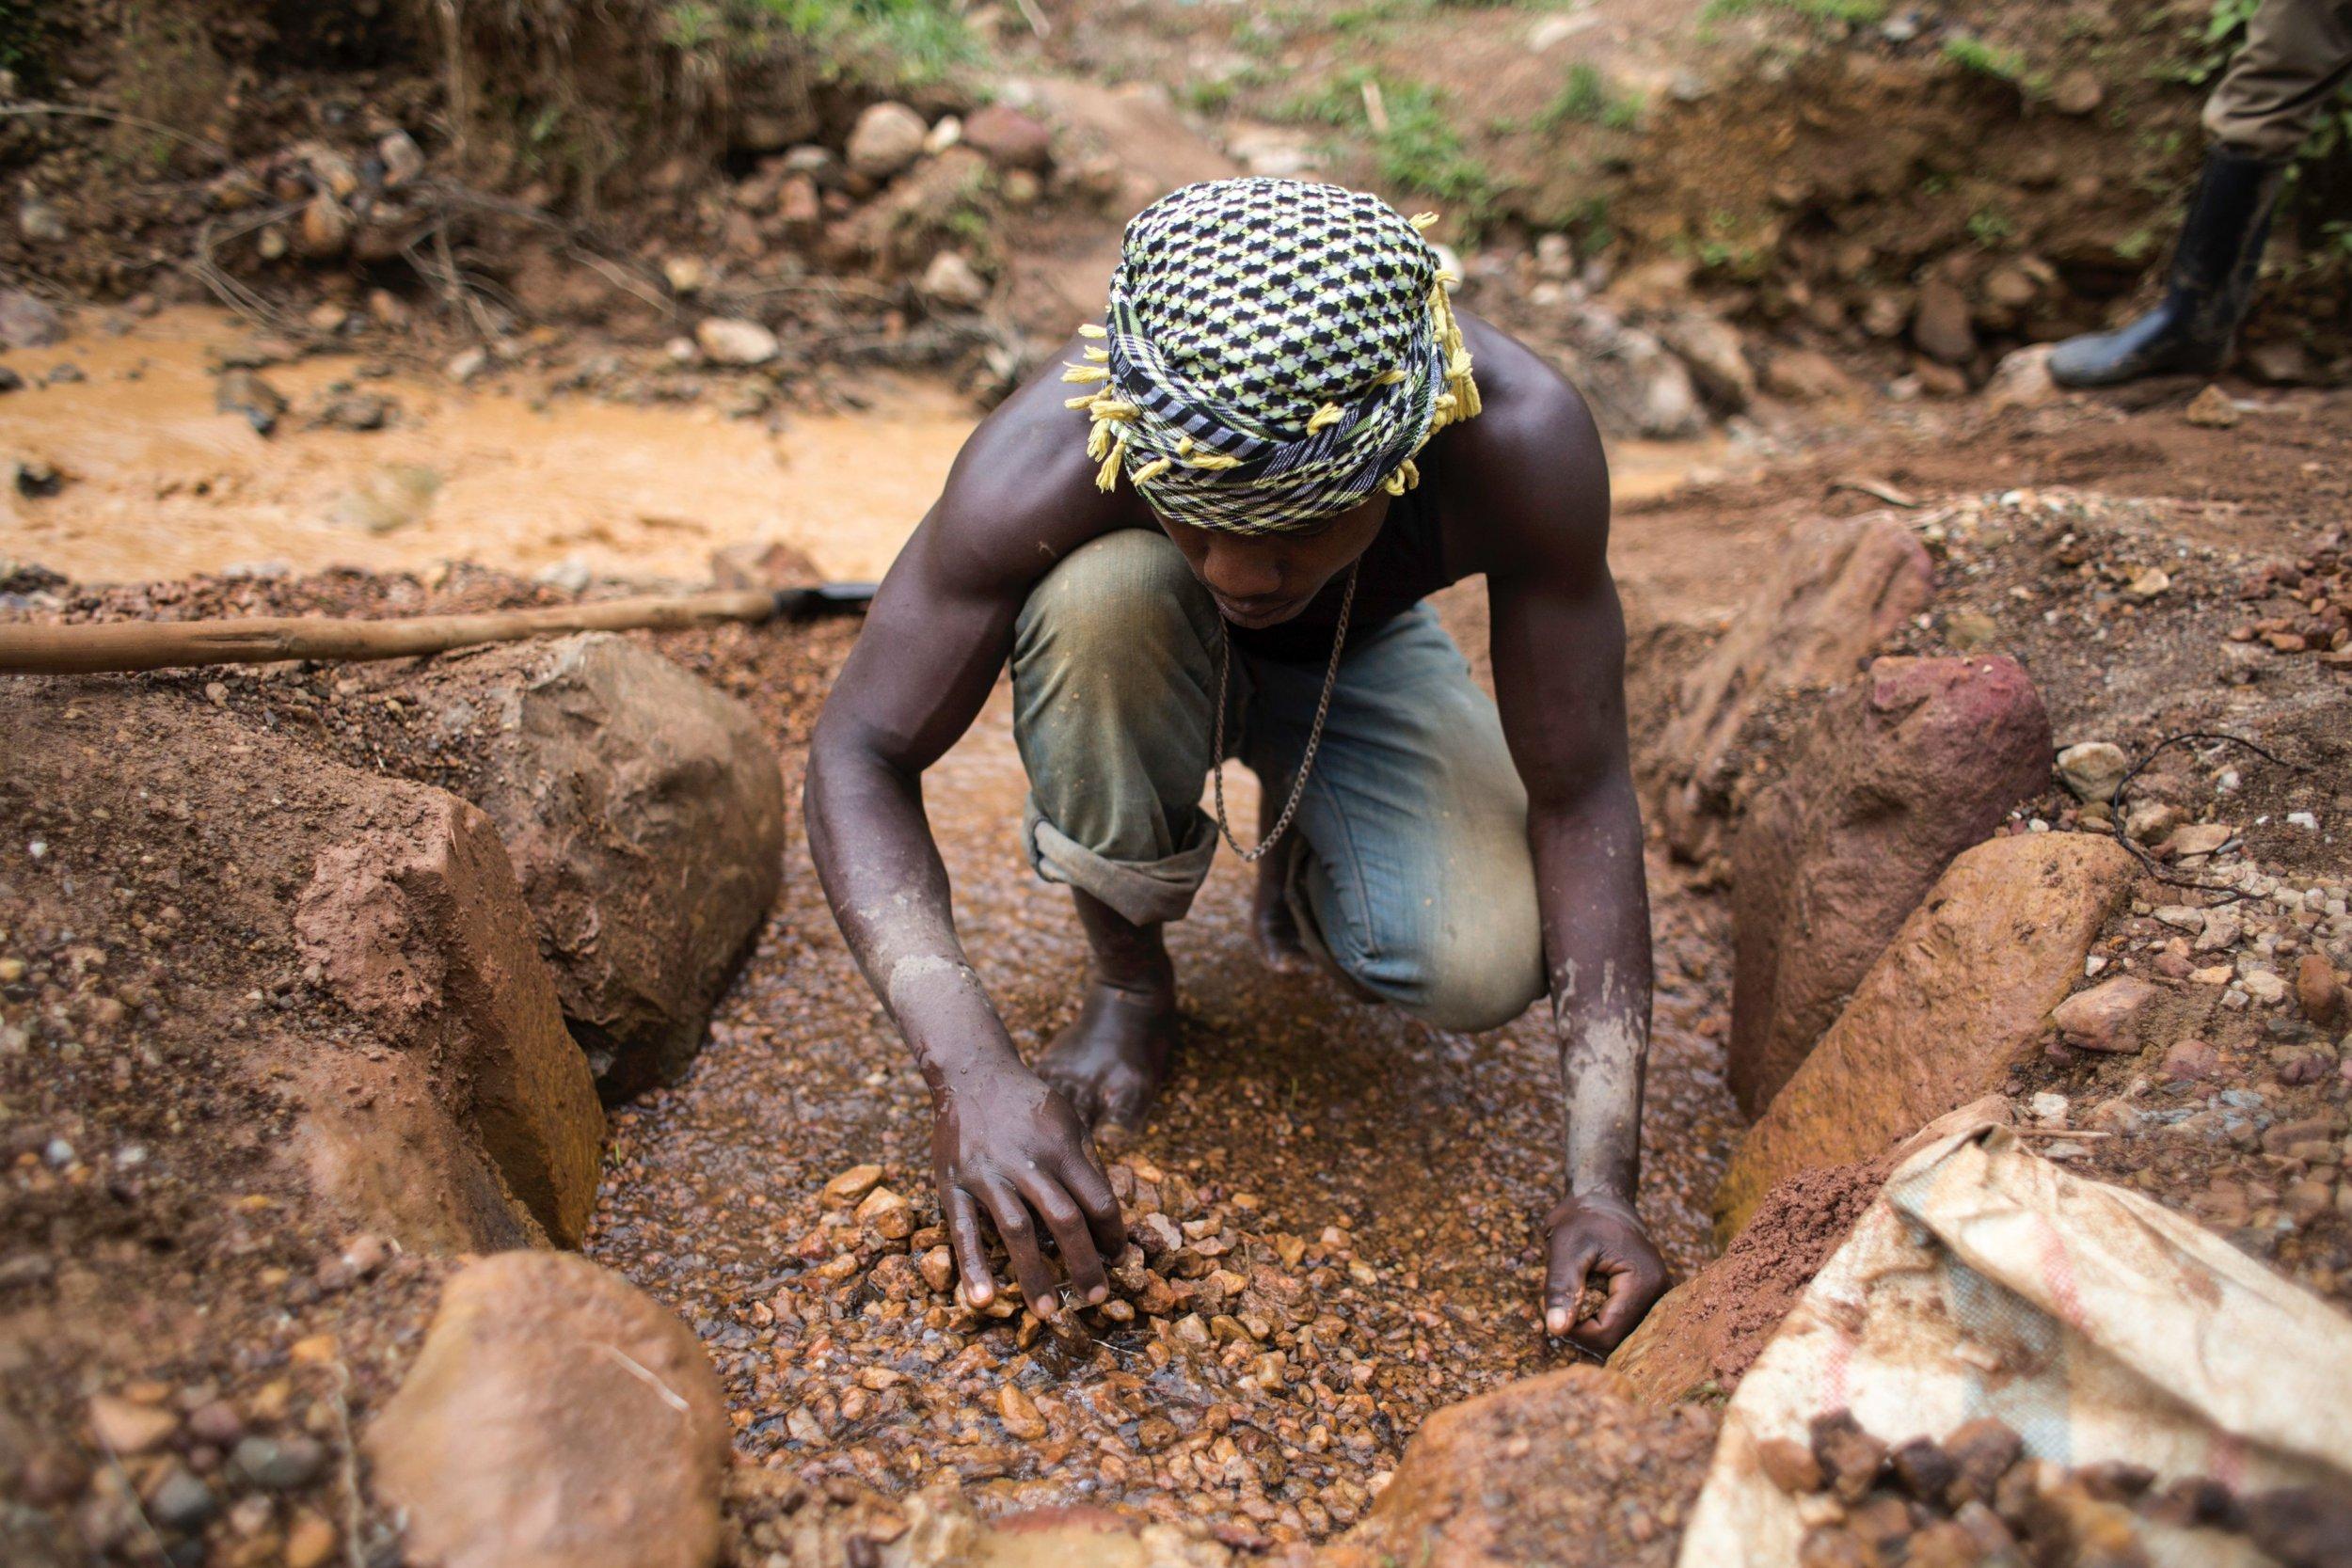 Congo artisanal miner